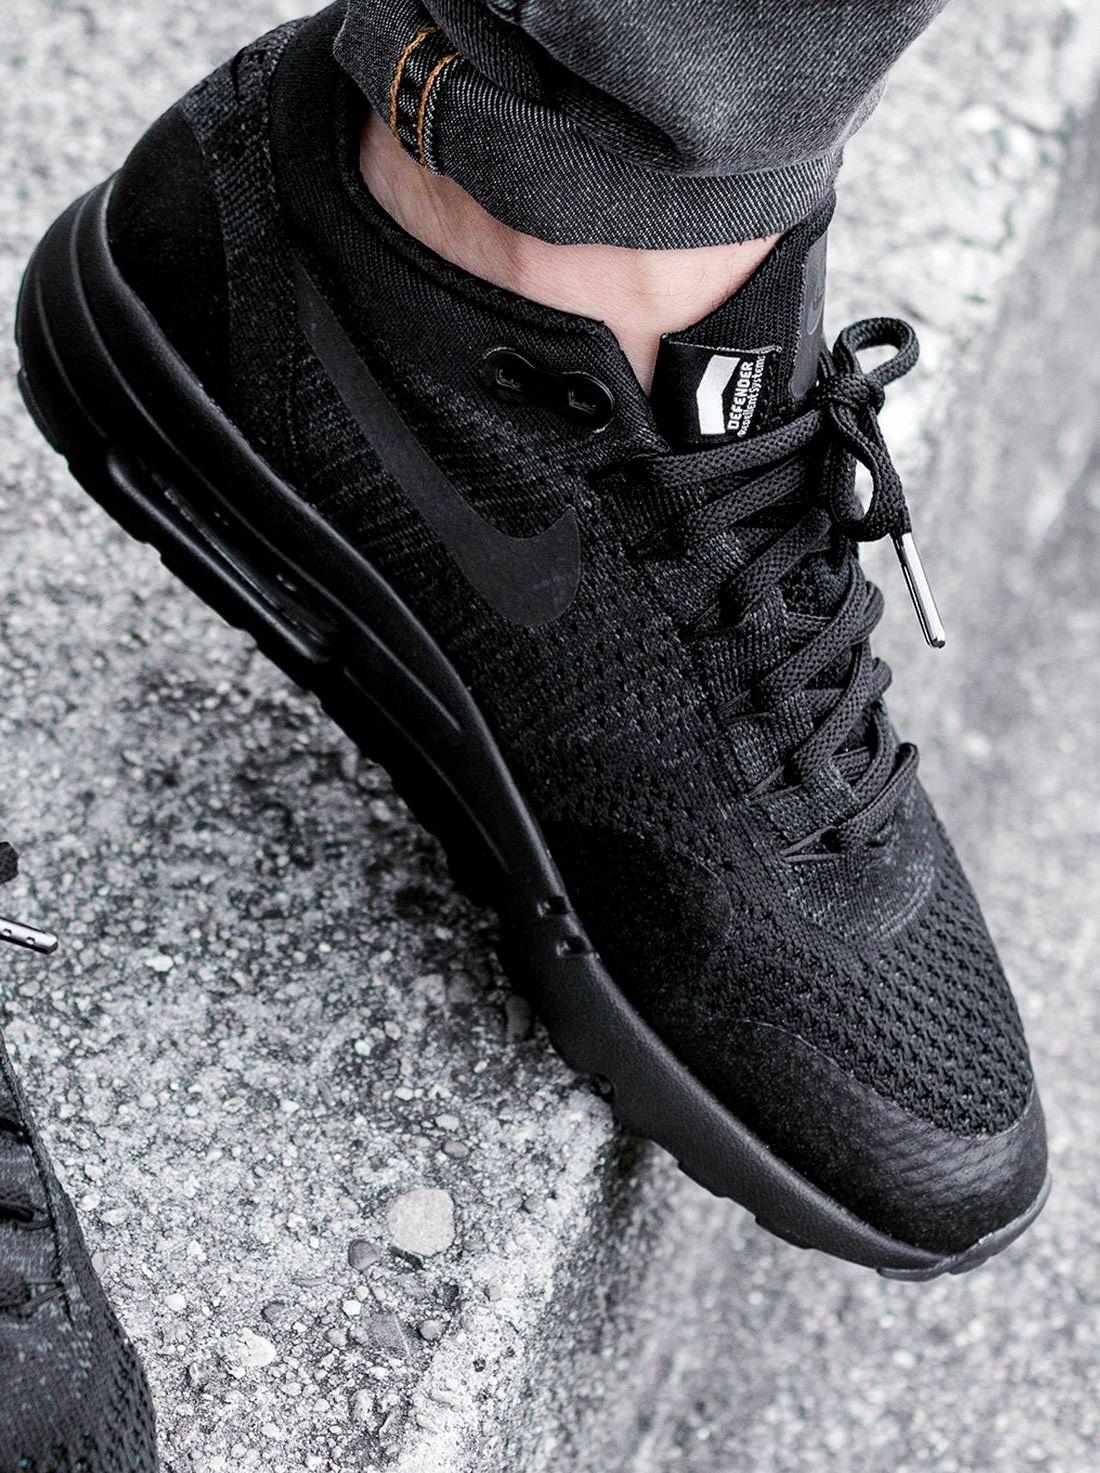 Nike Air Max 1 Ultra Flyknit 'Blackout' | Nike air max, Nike ...